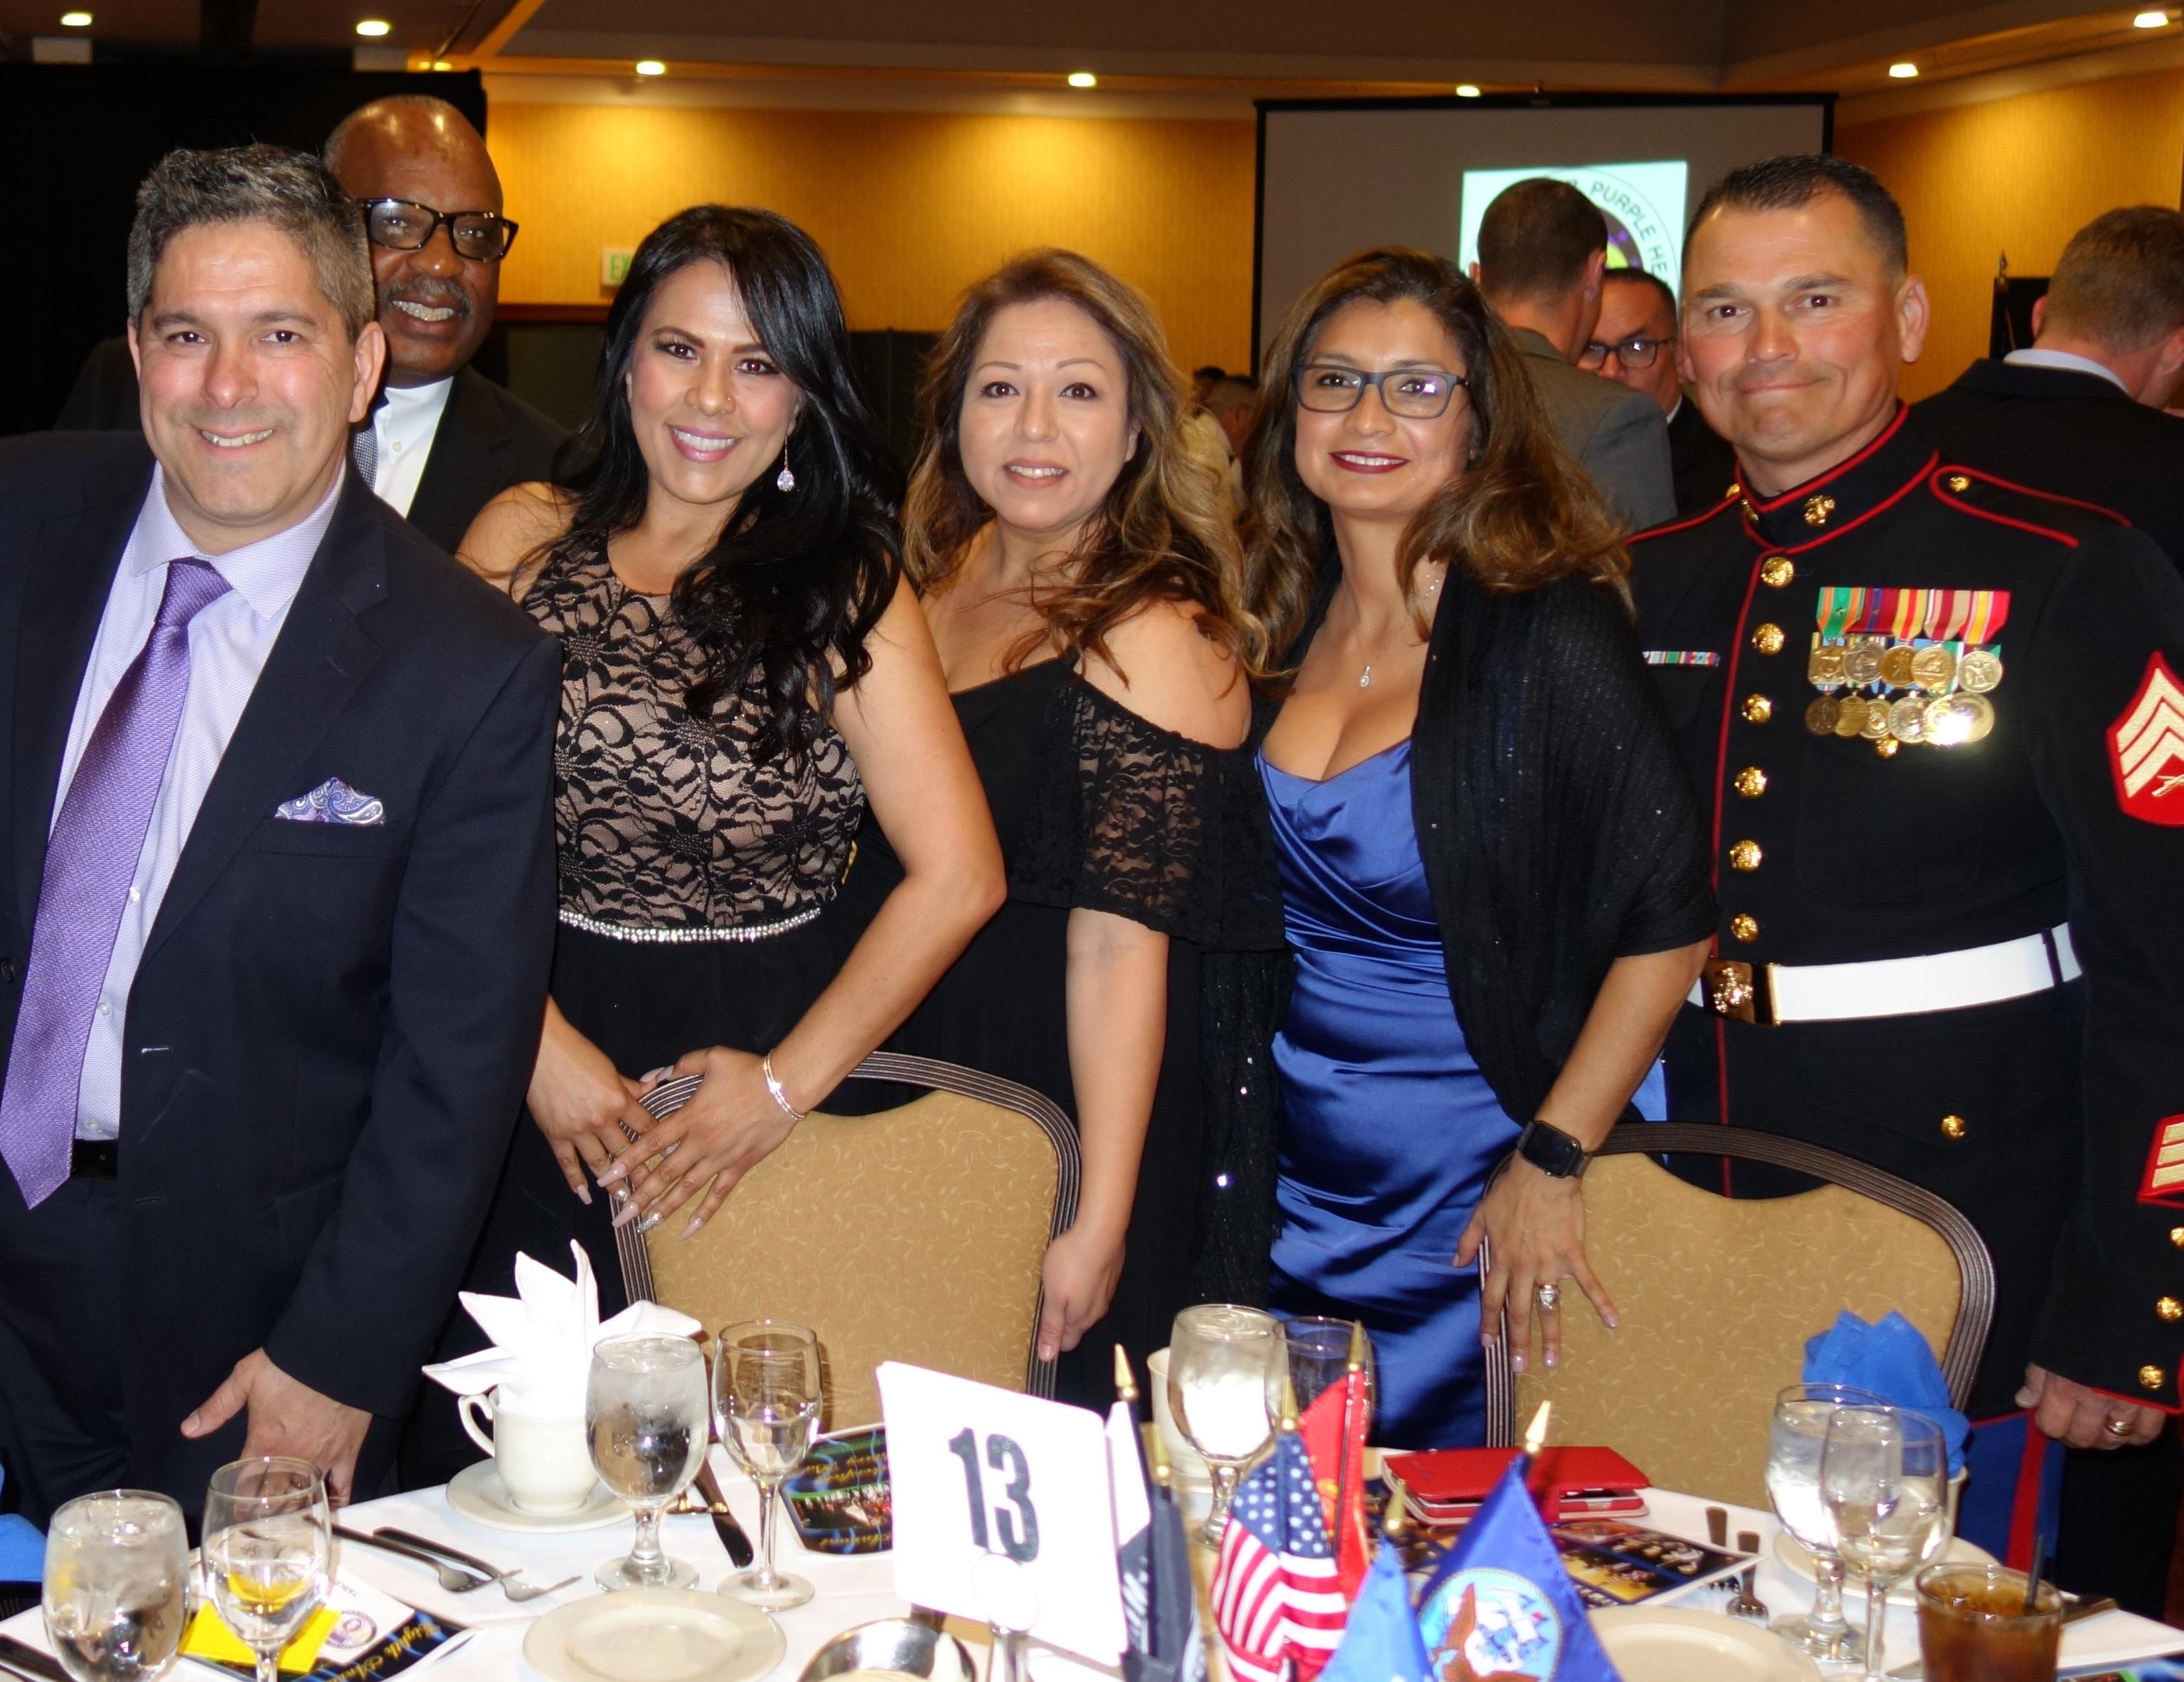 Paul Beckworth, Steve Watkins, Lisa Kent, Sandra Beckworth, Olivia Garcia, Sgt. Julio Garcia.